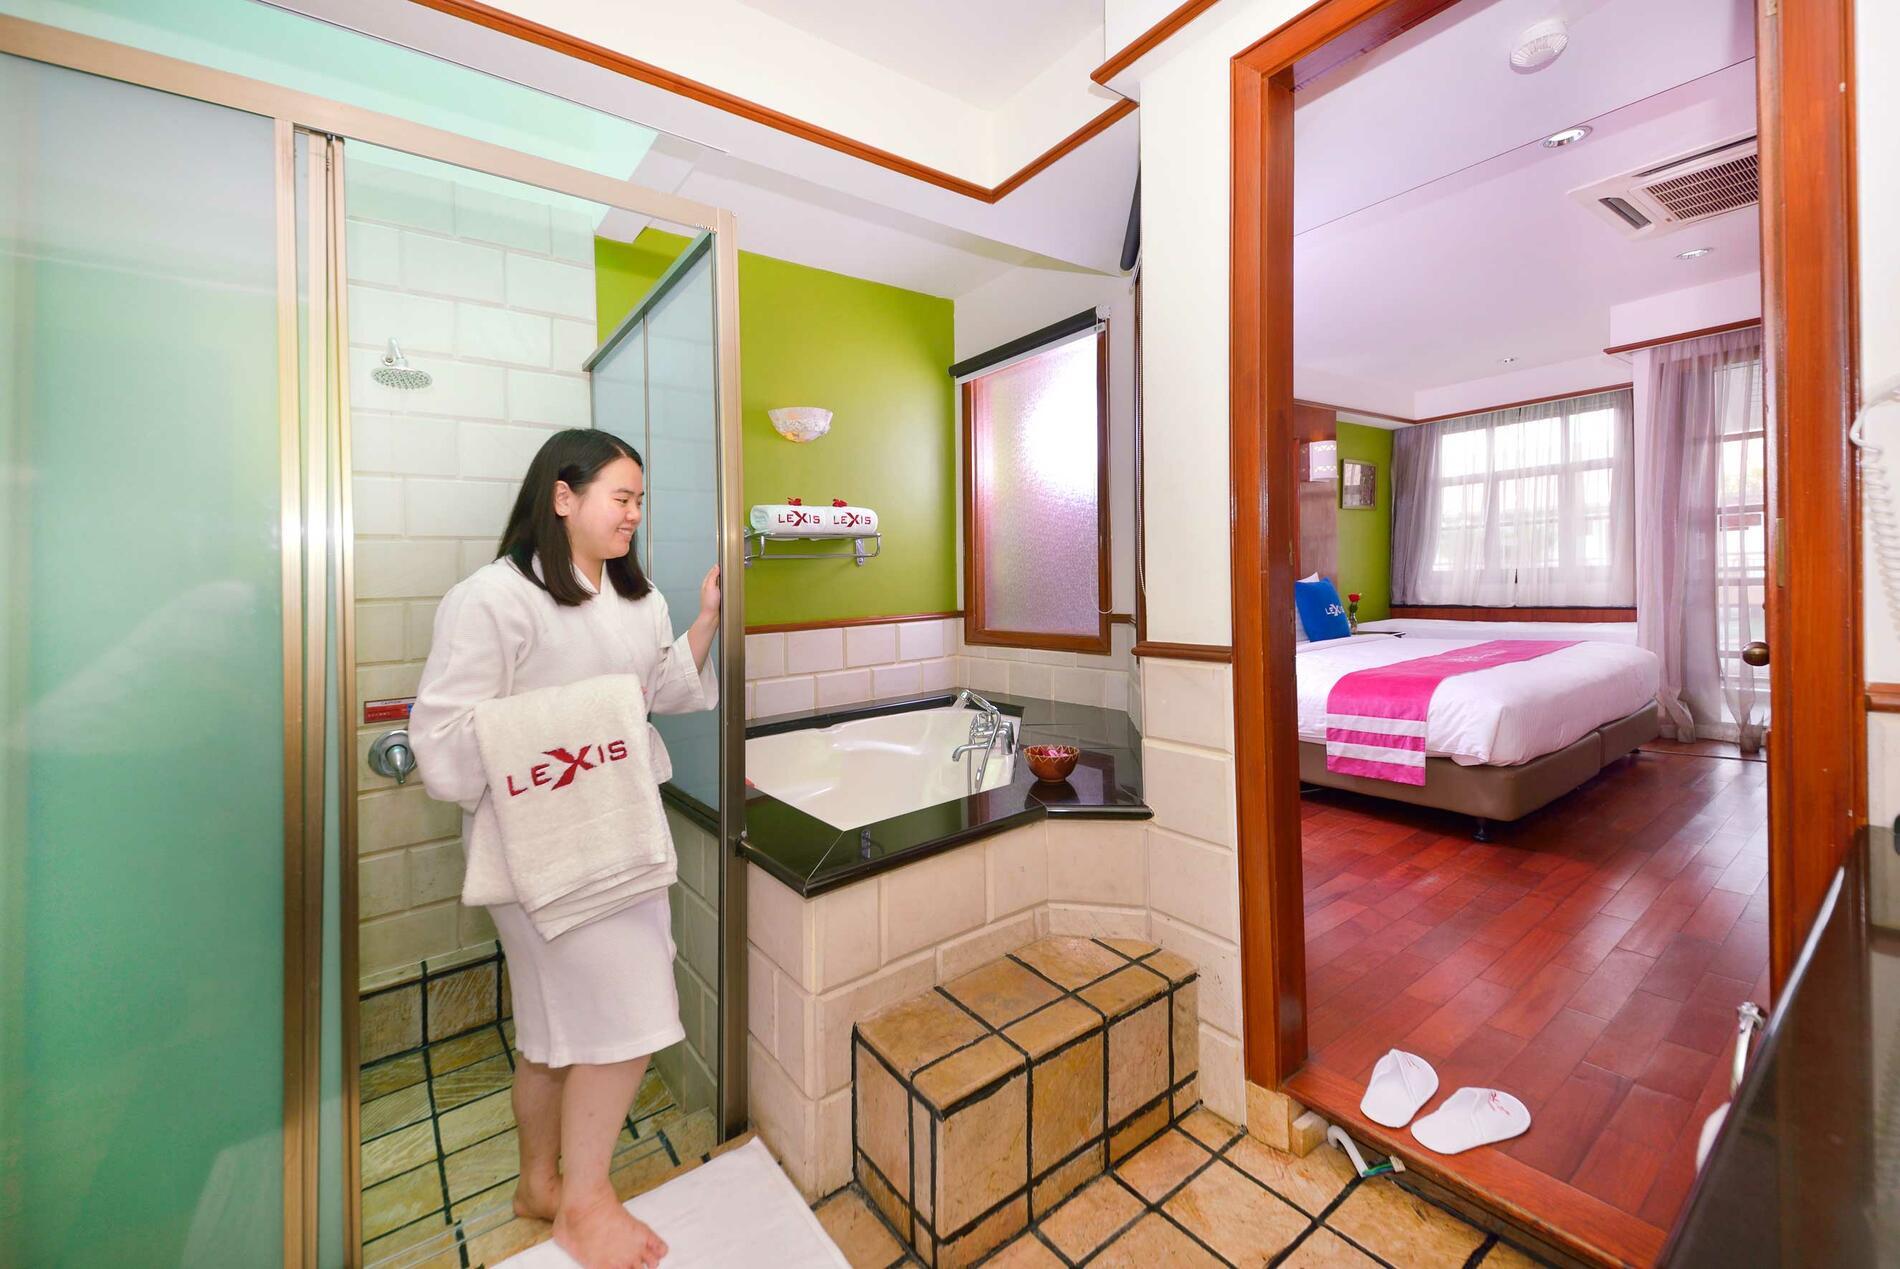 Lexis Port Dickson Deluxe Water Chalet | Lexis Hotel Port Dickso